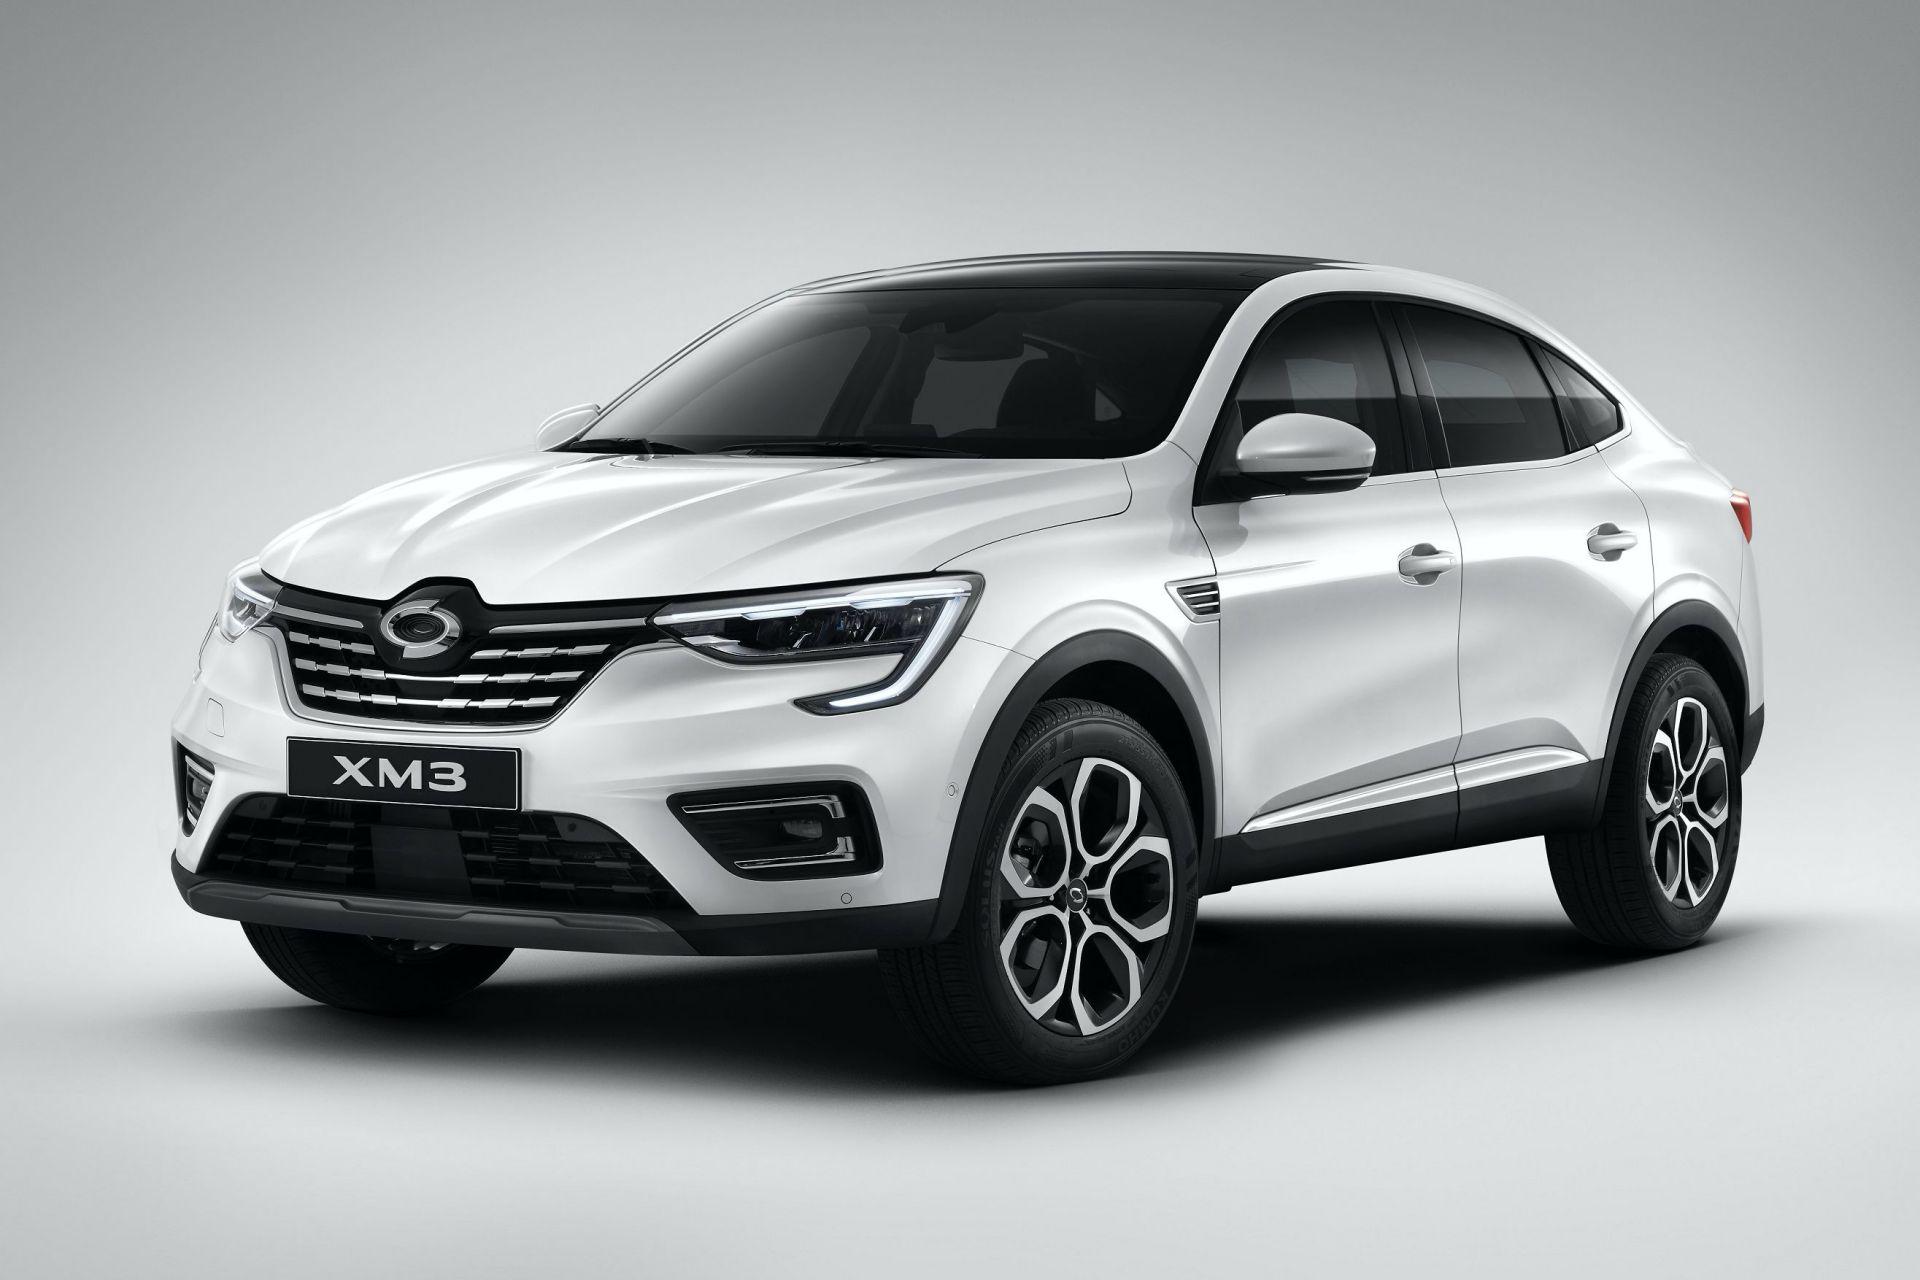 Renault_Samsung_XM3_0008